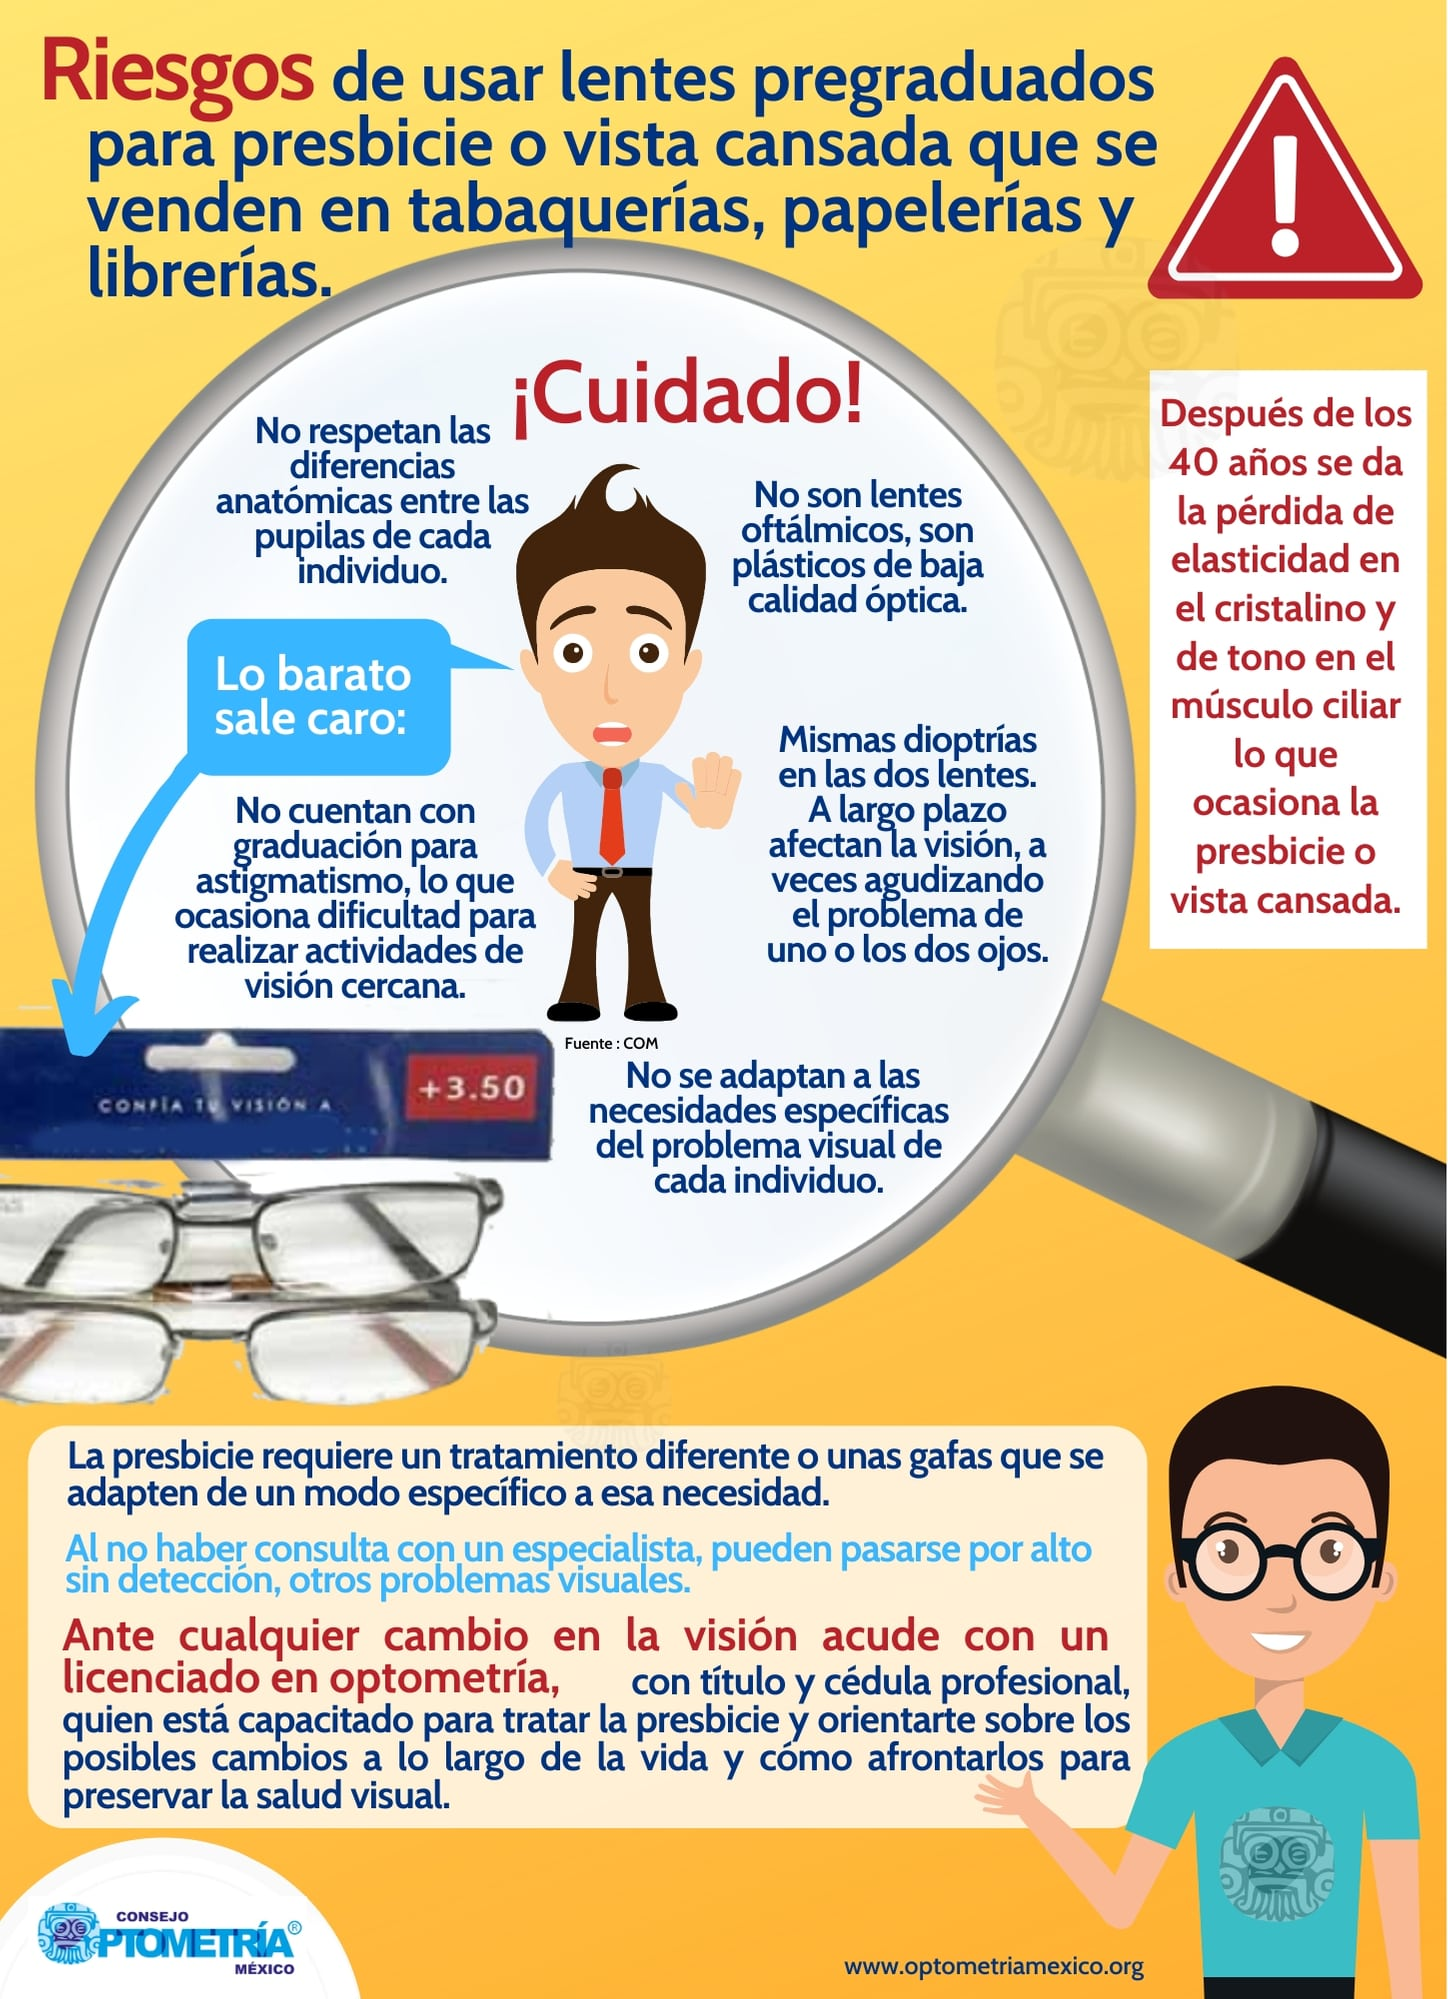 Riesgos de usar lentes pregraduados para vista cansada (Presbicie)2 Consejo_Optometría_México-min